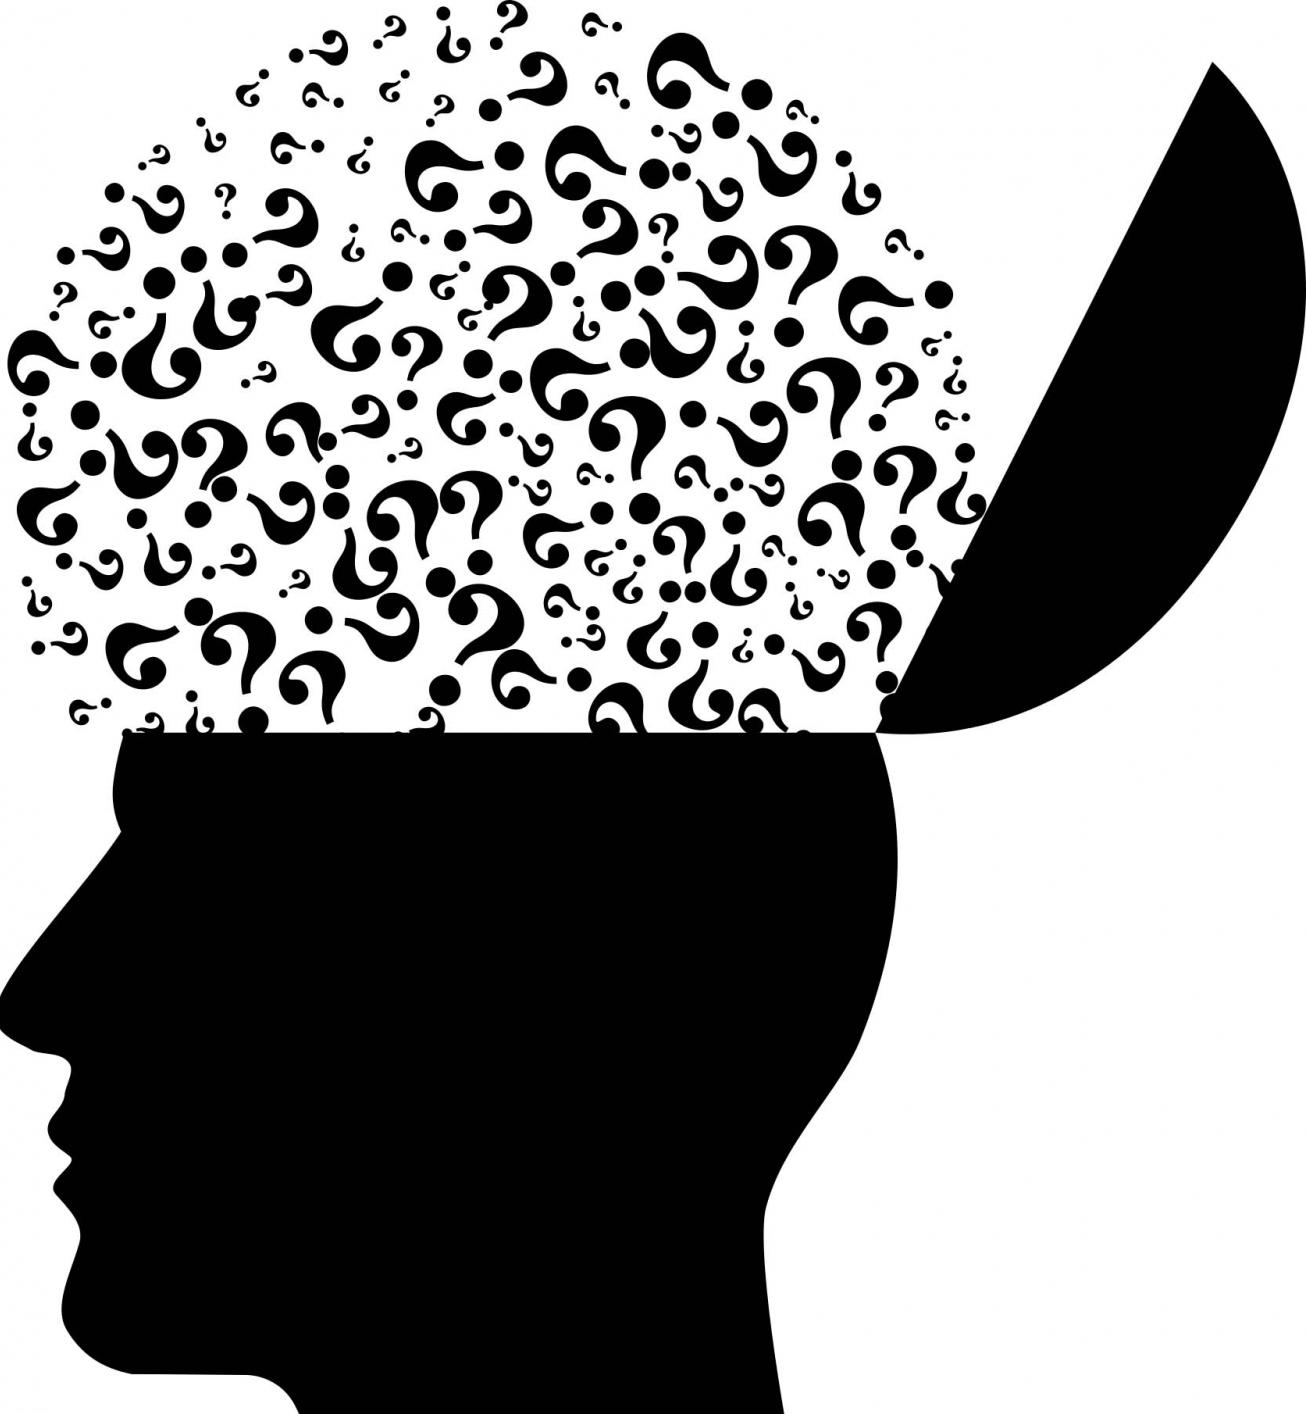 Men's brains diminish faster than women's: Study